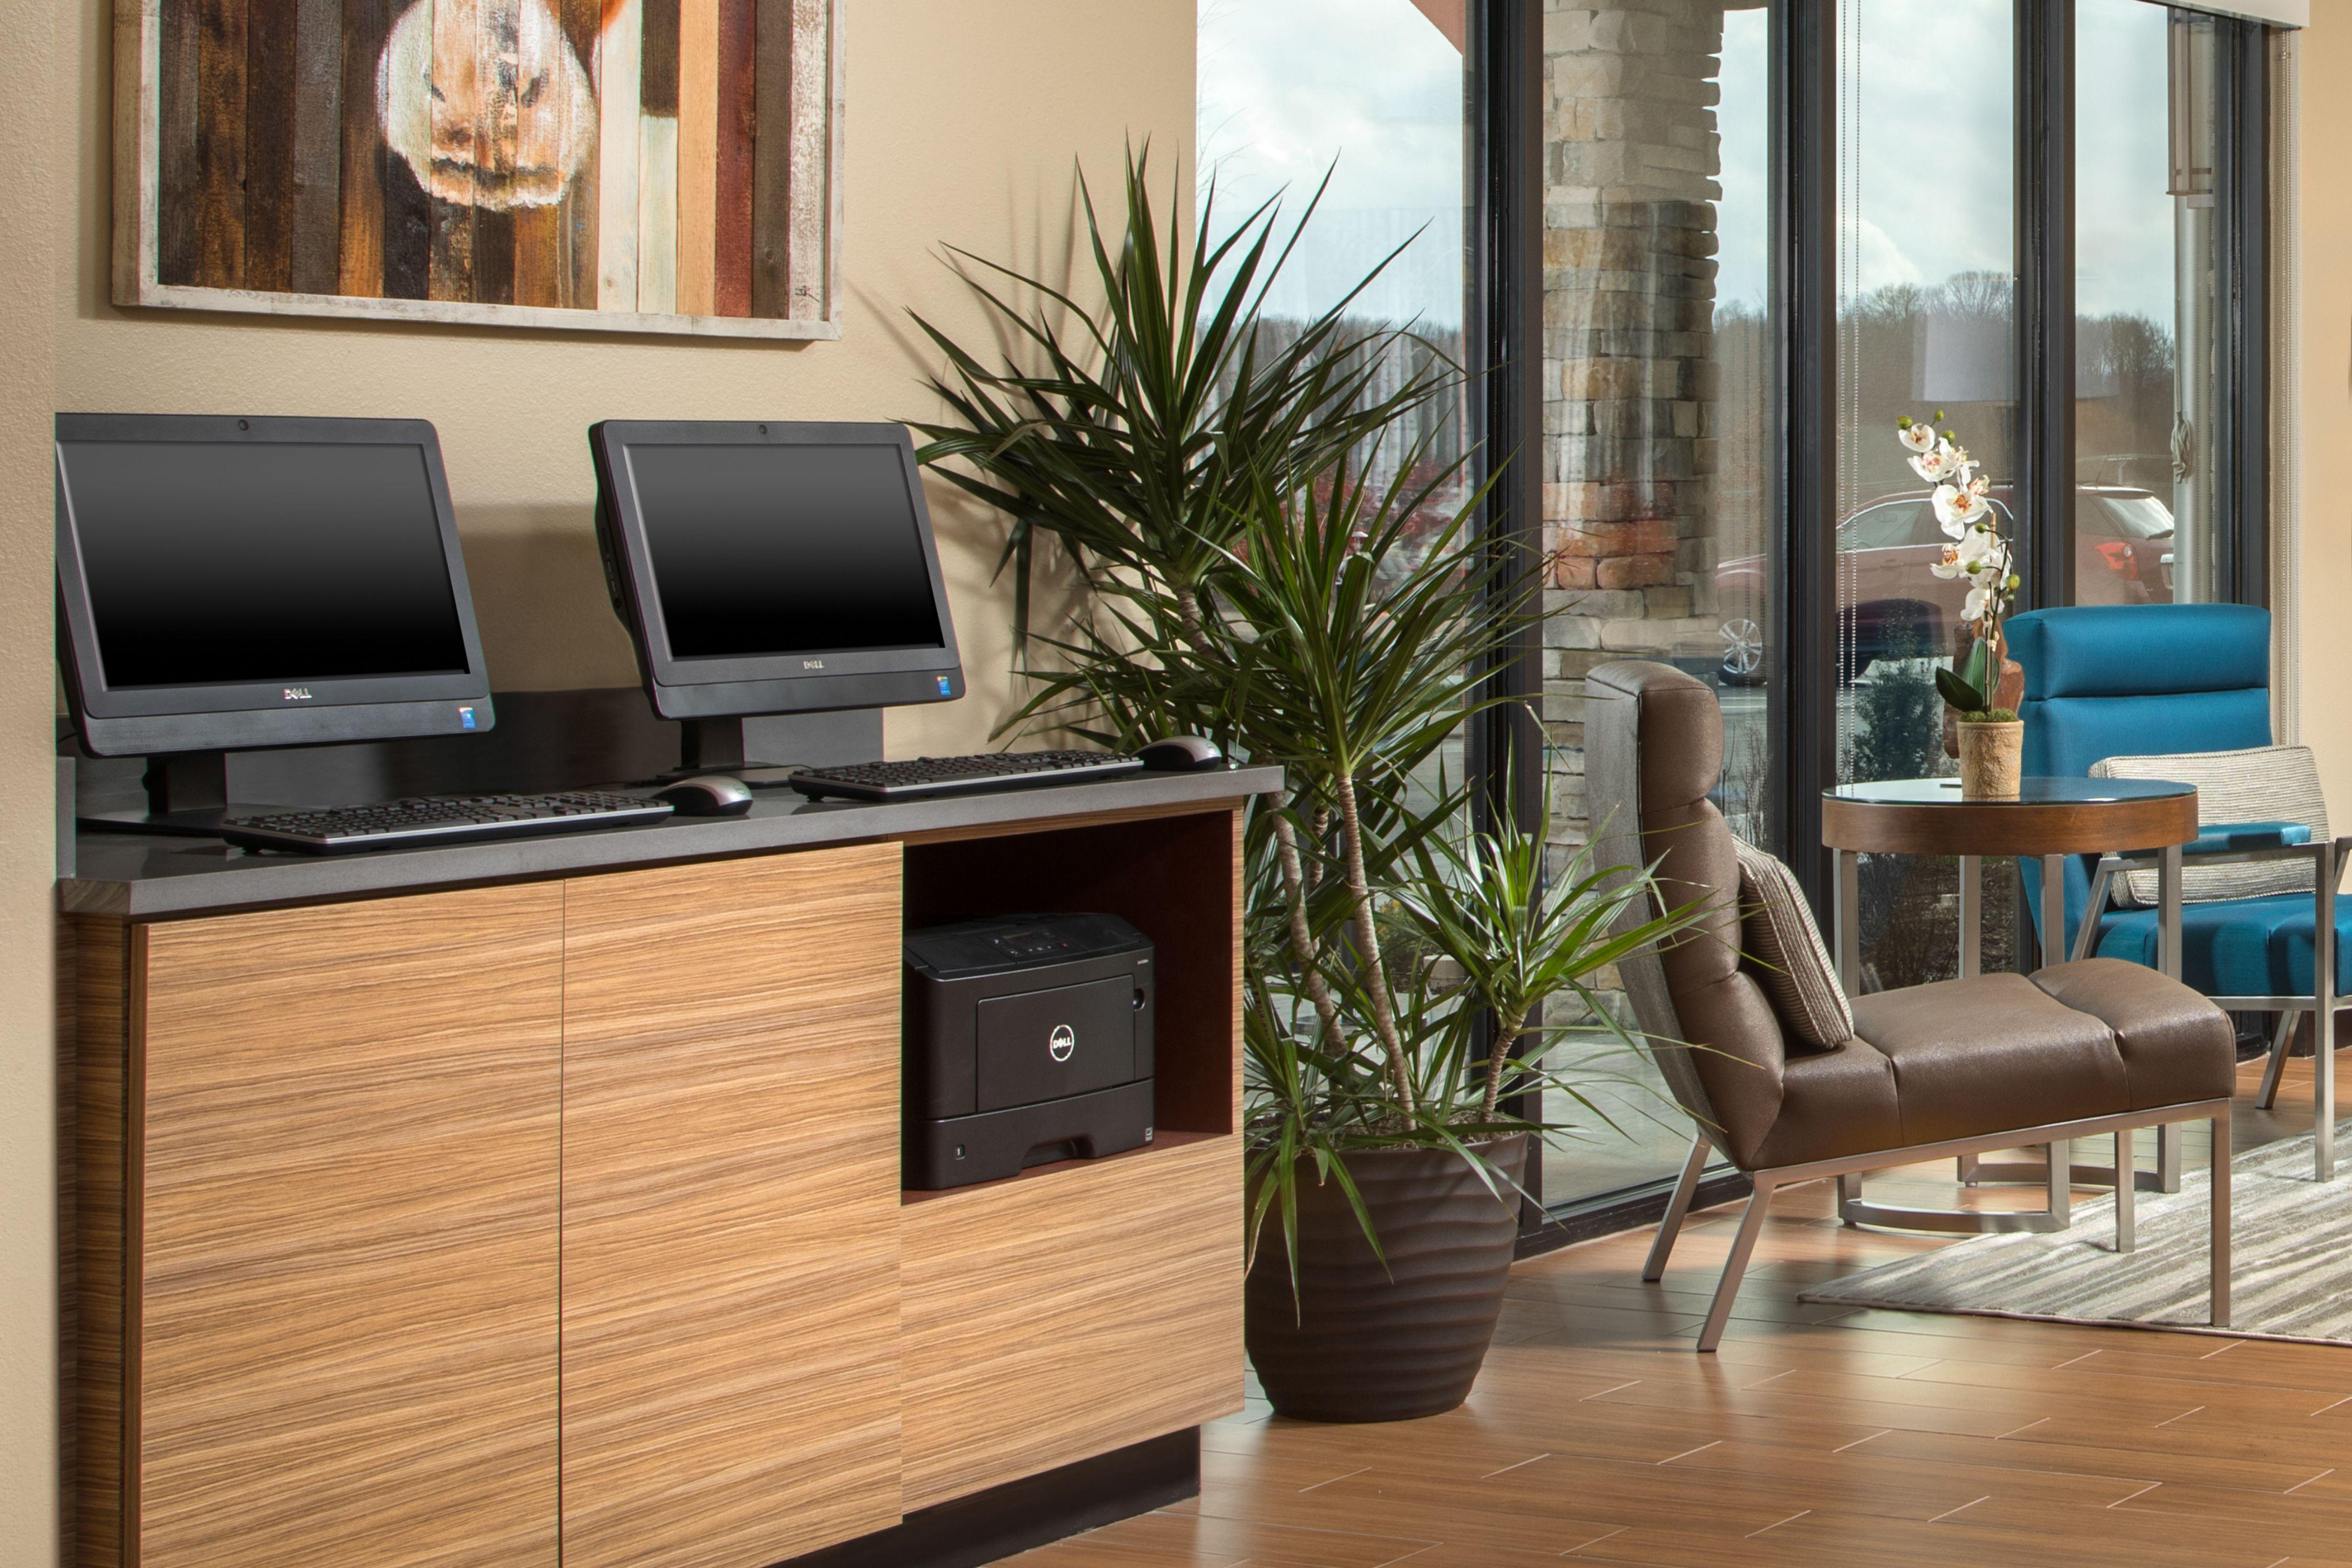 TownePlace Suites by Marriott Nashville Smyrna image 1